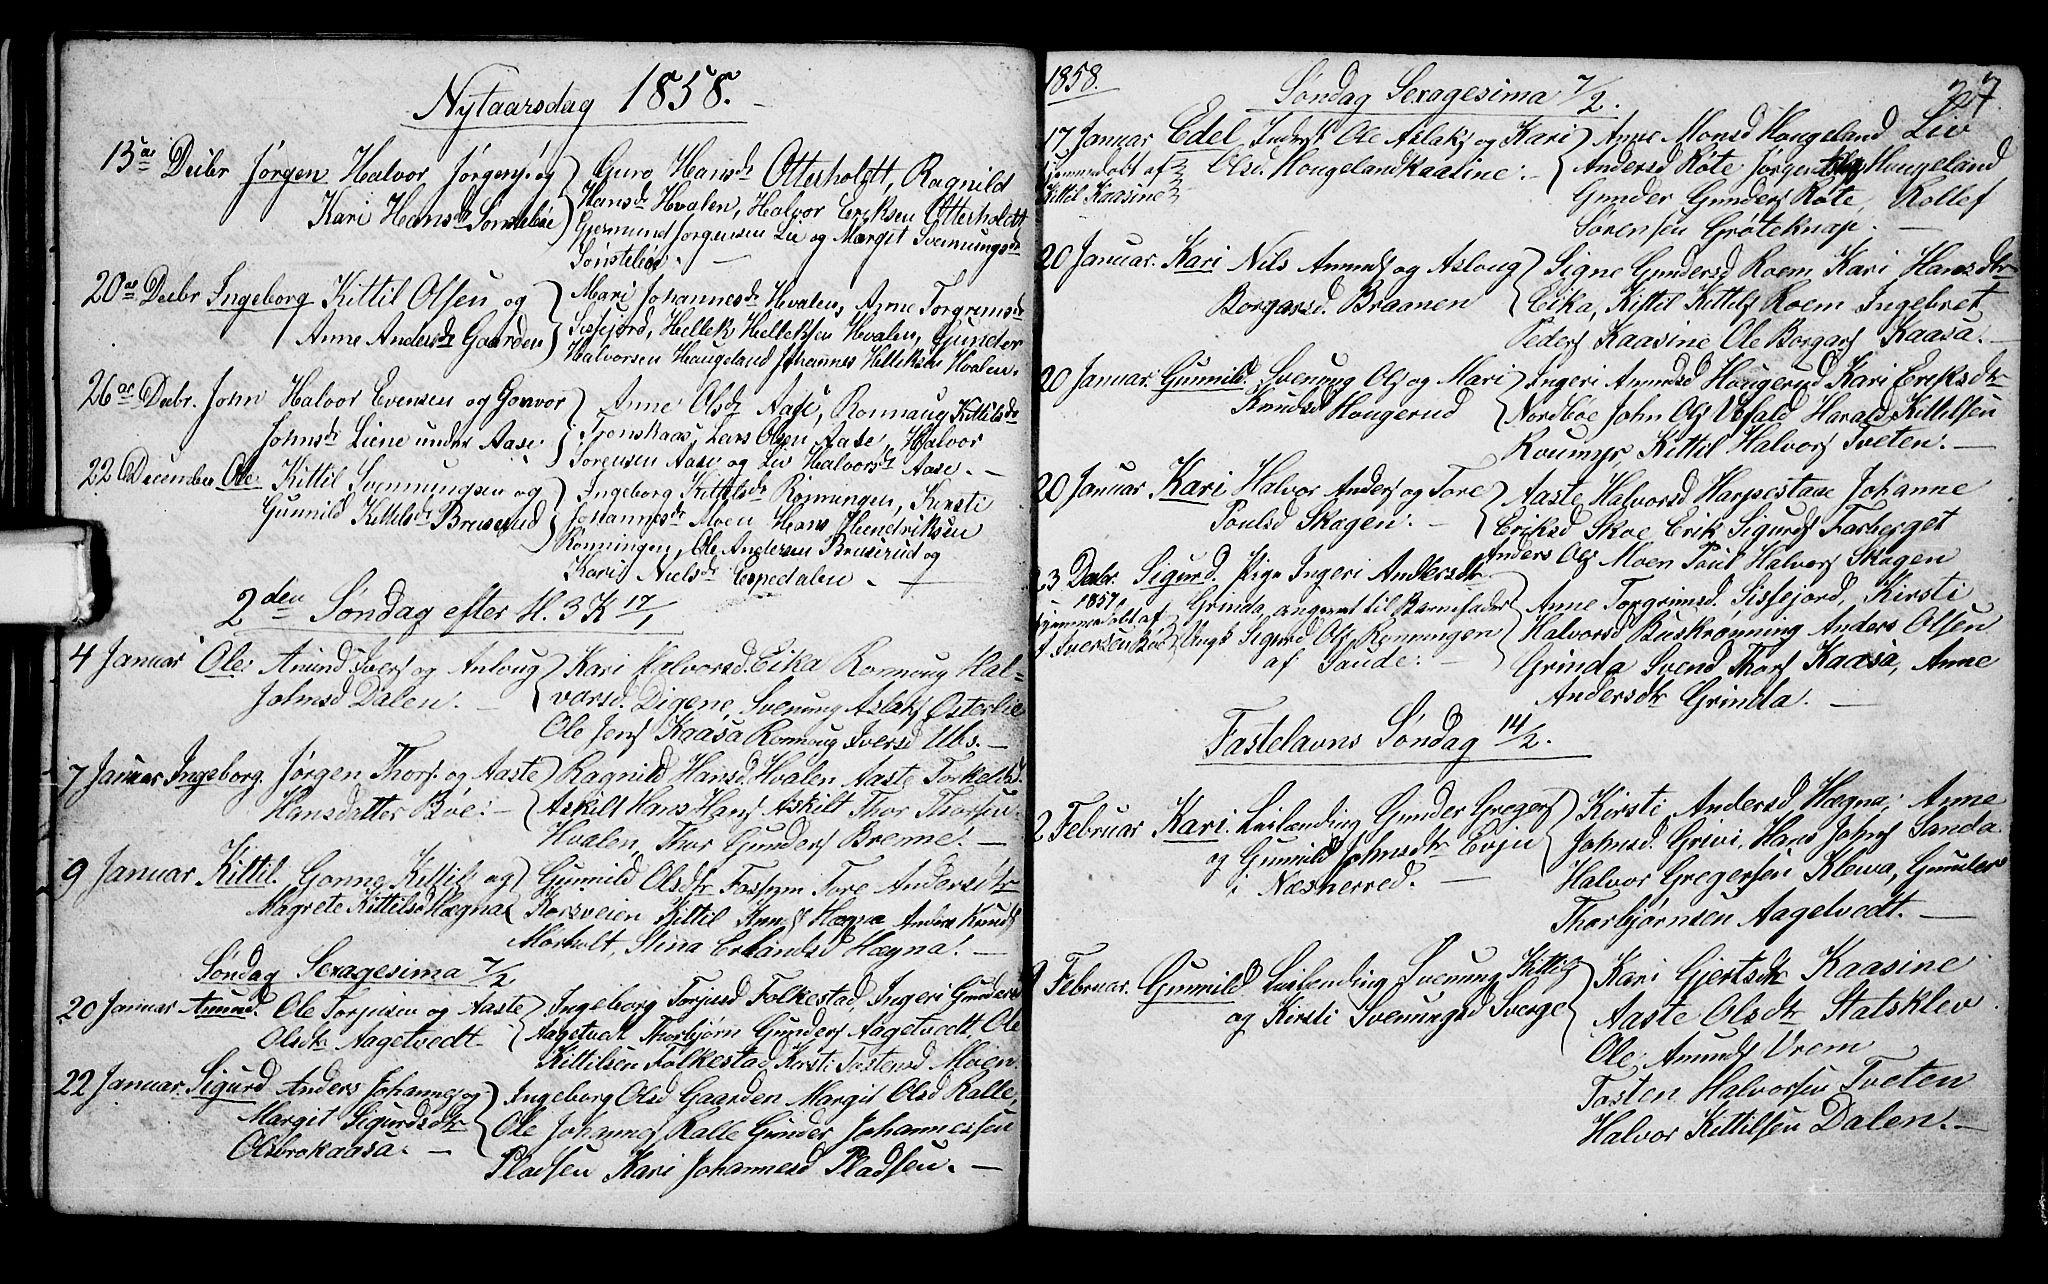 SAKO, Bø kirkebøker, G/Ga/L0002: Klokkerbok nr. 2, 1853-1866, s. 27